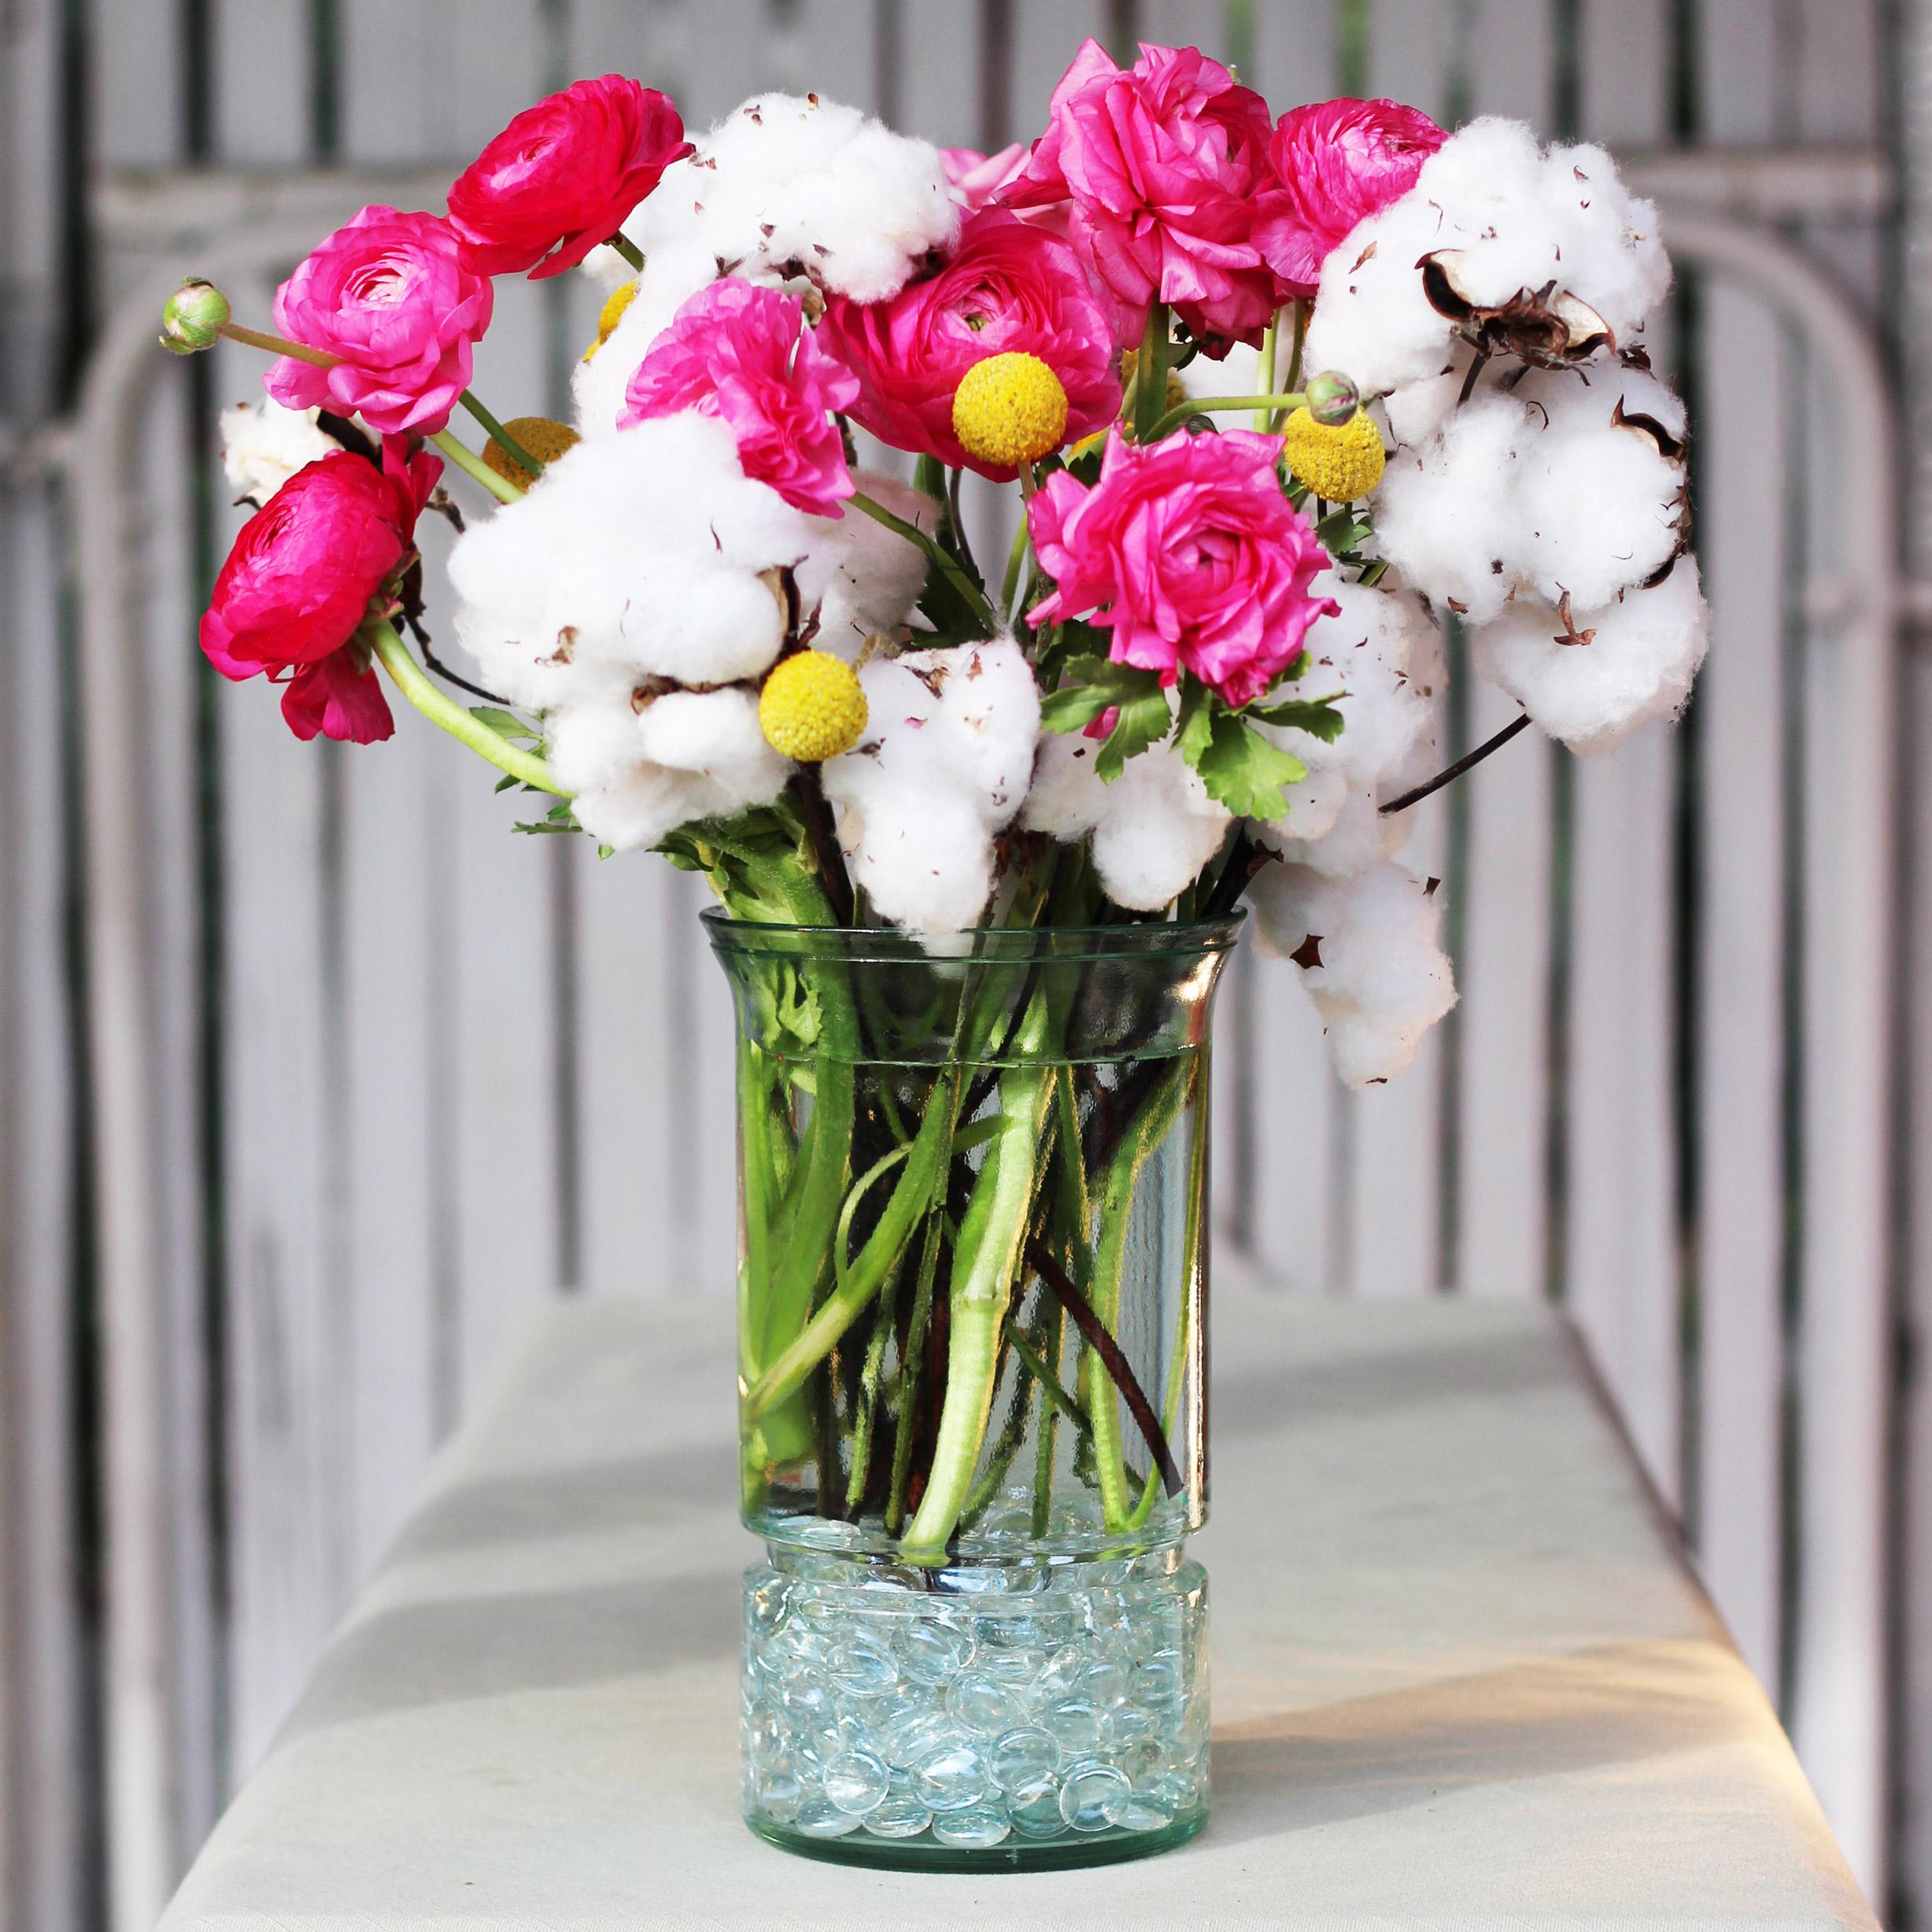 Add the pink Ranunculus.